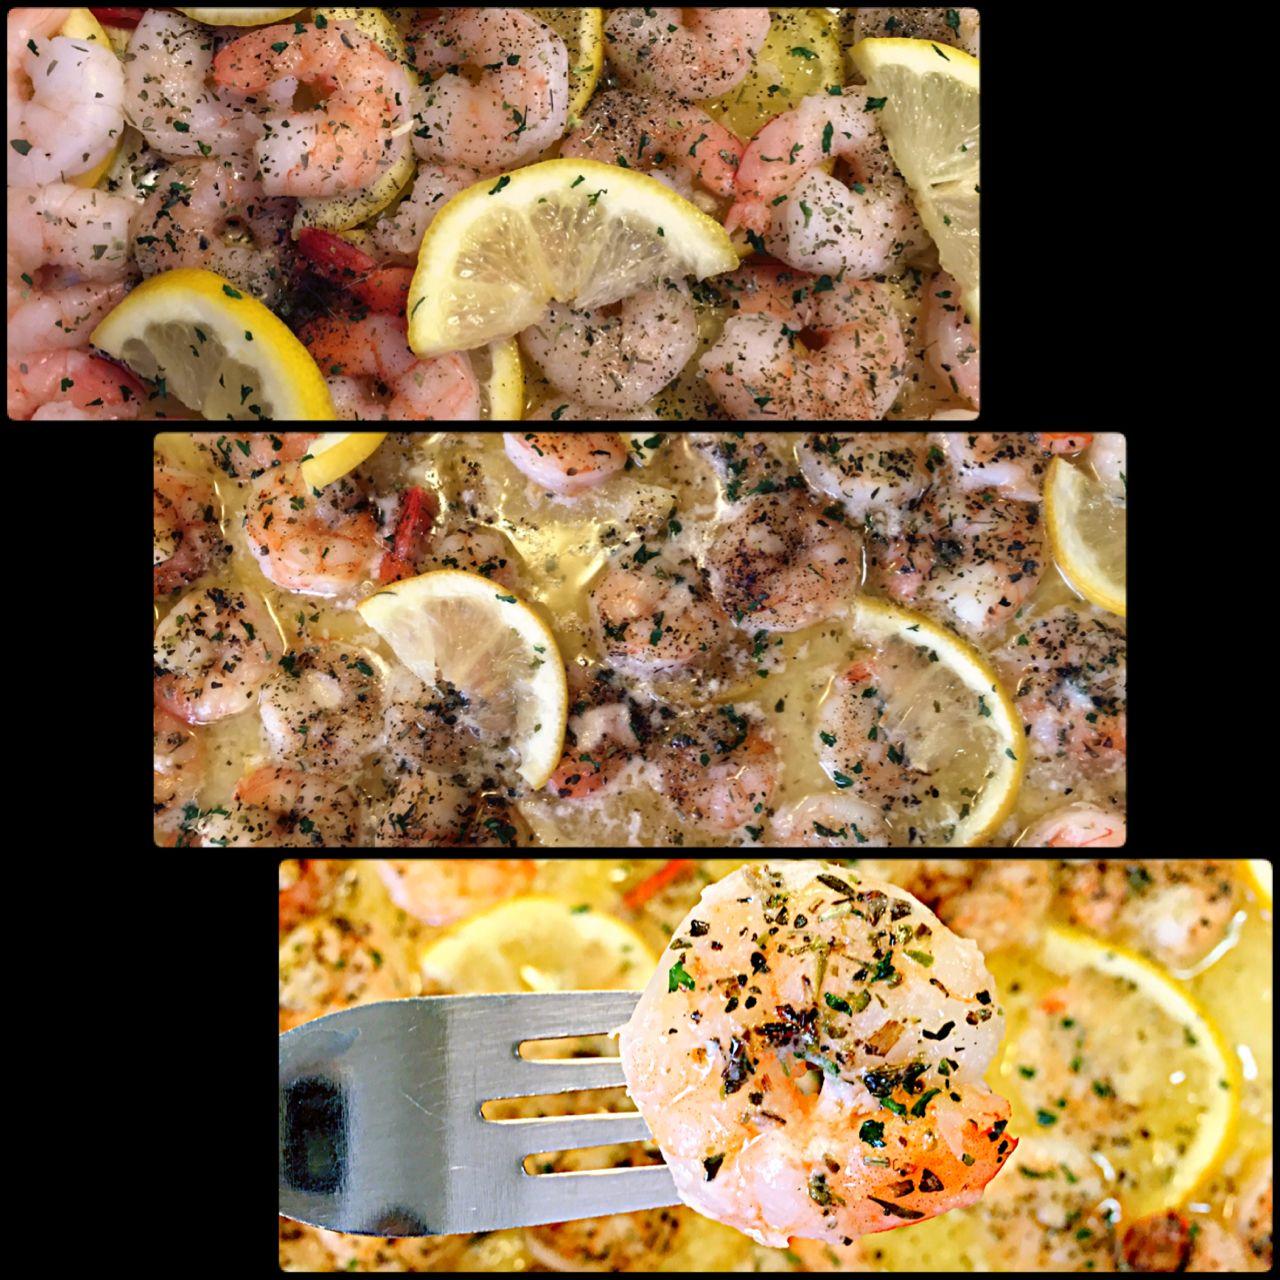 Lemon Butter Baked Shrimp 1 lb. raw shrimp, cleaned, peeled and deveined 8 Tbs. butter (1 stick), melted 3 cloves garlic, minced (I used garlic salt) Italian seasoning 1 1/2 lemon, sliced  1 Tbs. dried parsley leaves 1 tsp. black pepper, ground